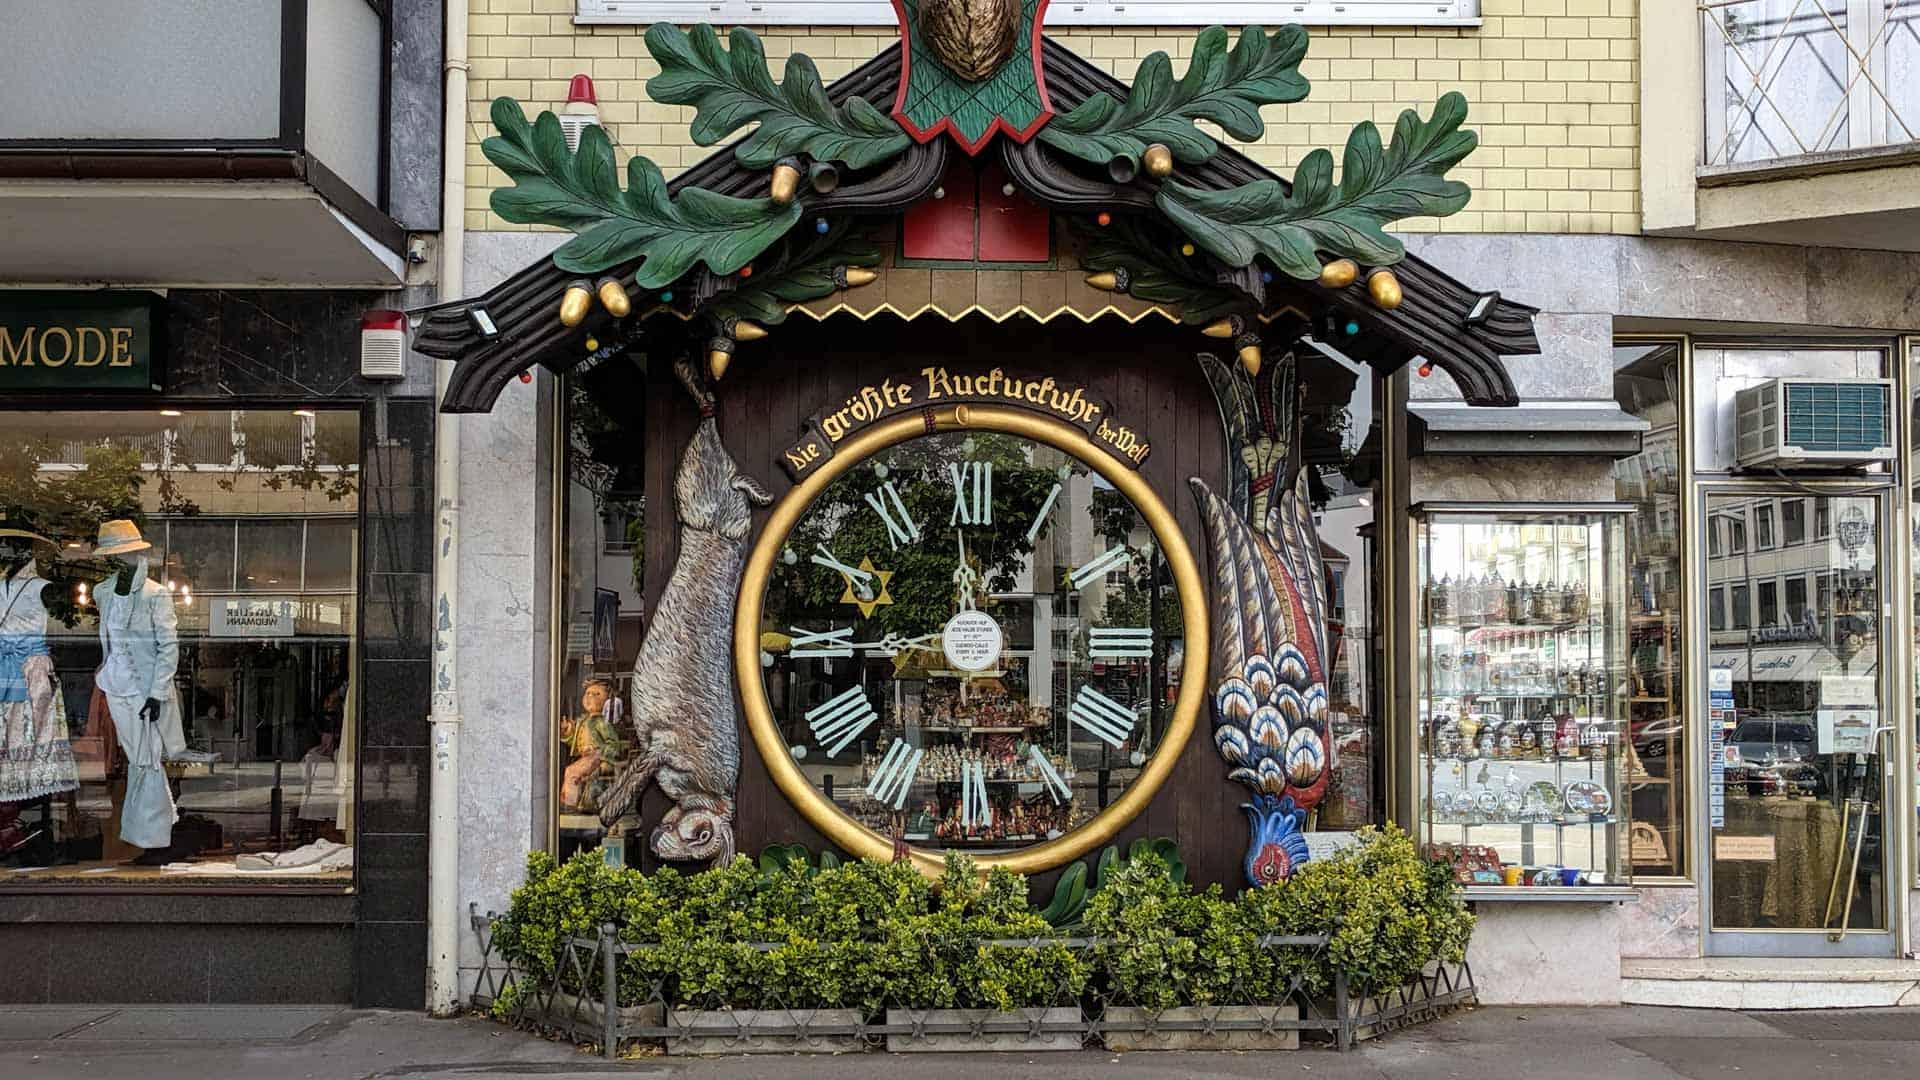 The Giant cuckoo clock of Wiesbaden